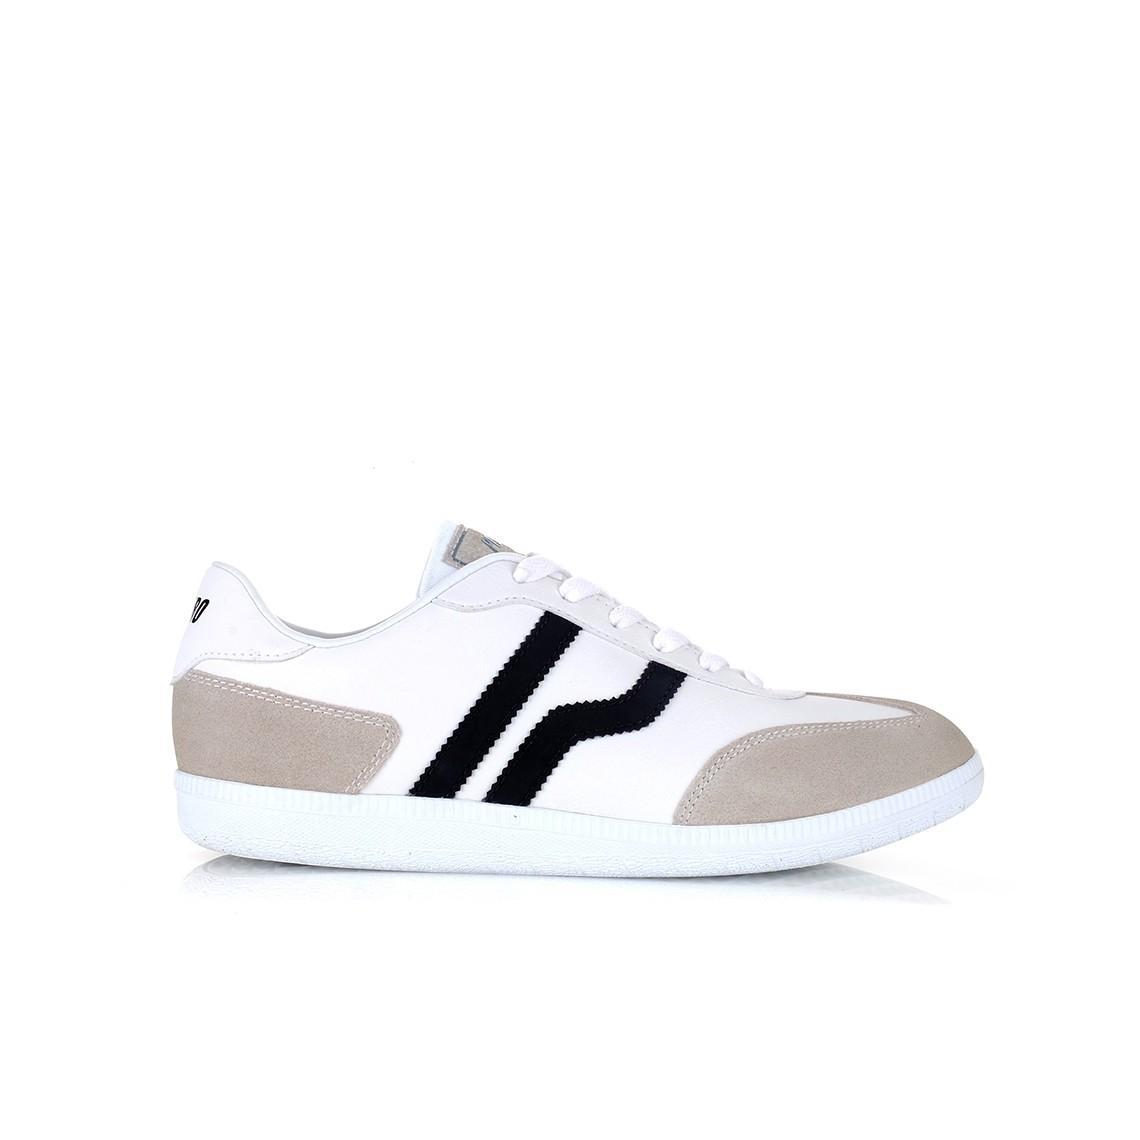 SEPATU PIERO JOGGER PREMIUM JALAPENOS - CHINESE RED/OFF WHITE. Source · Sepatu Sneakers